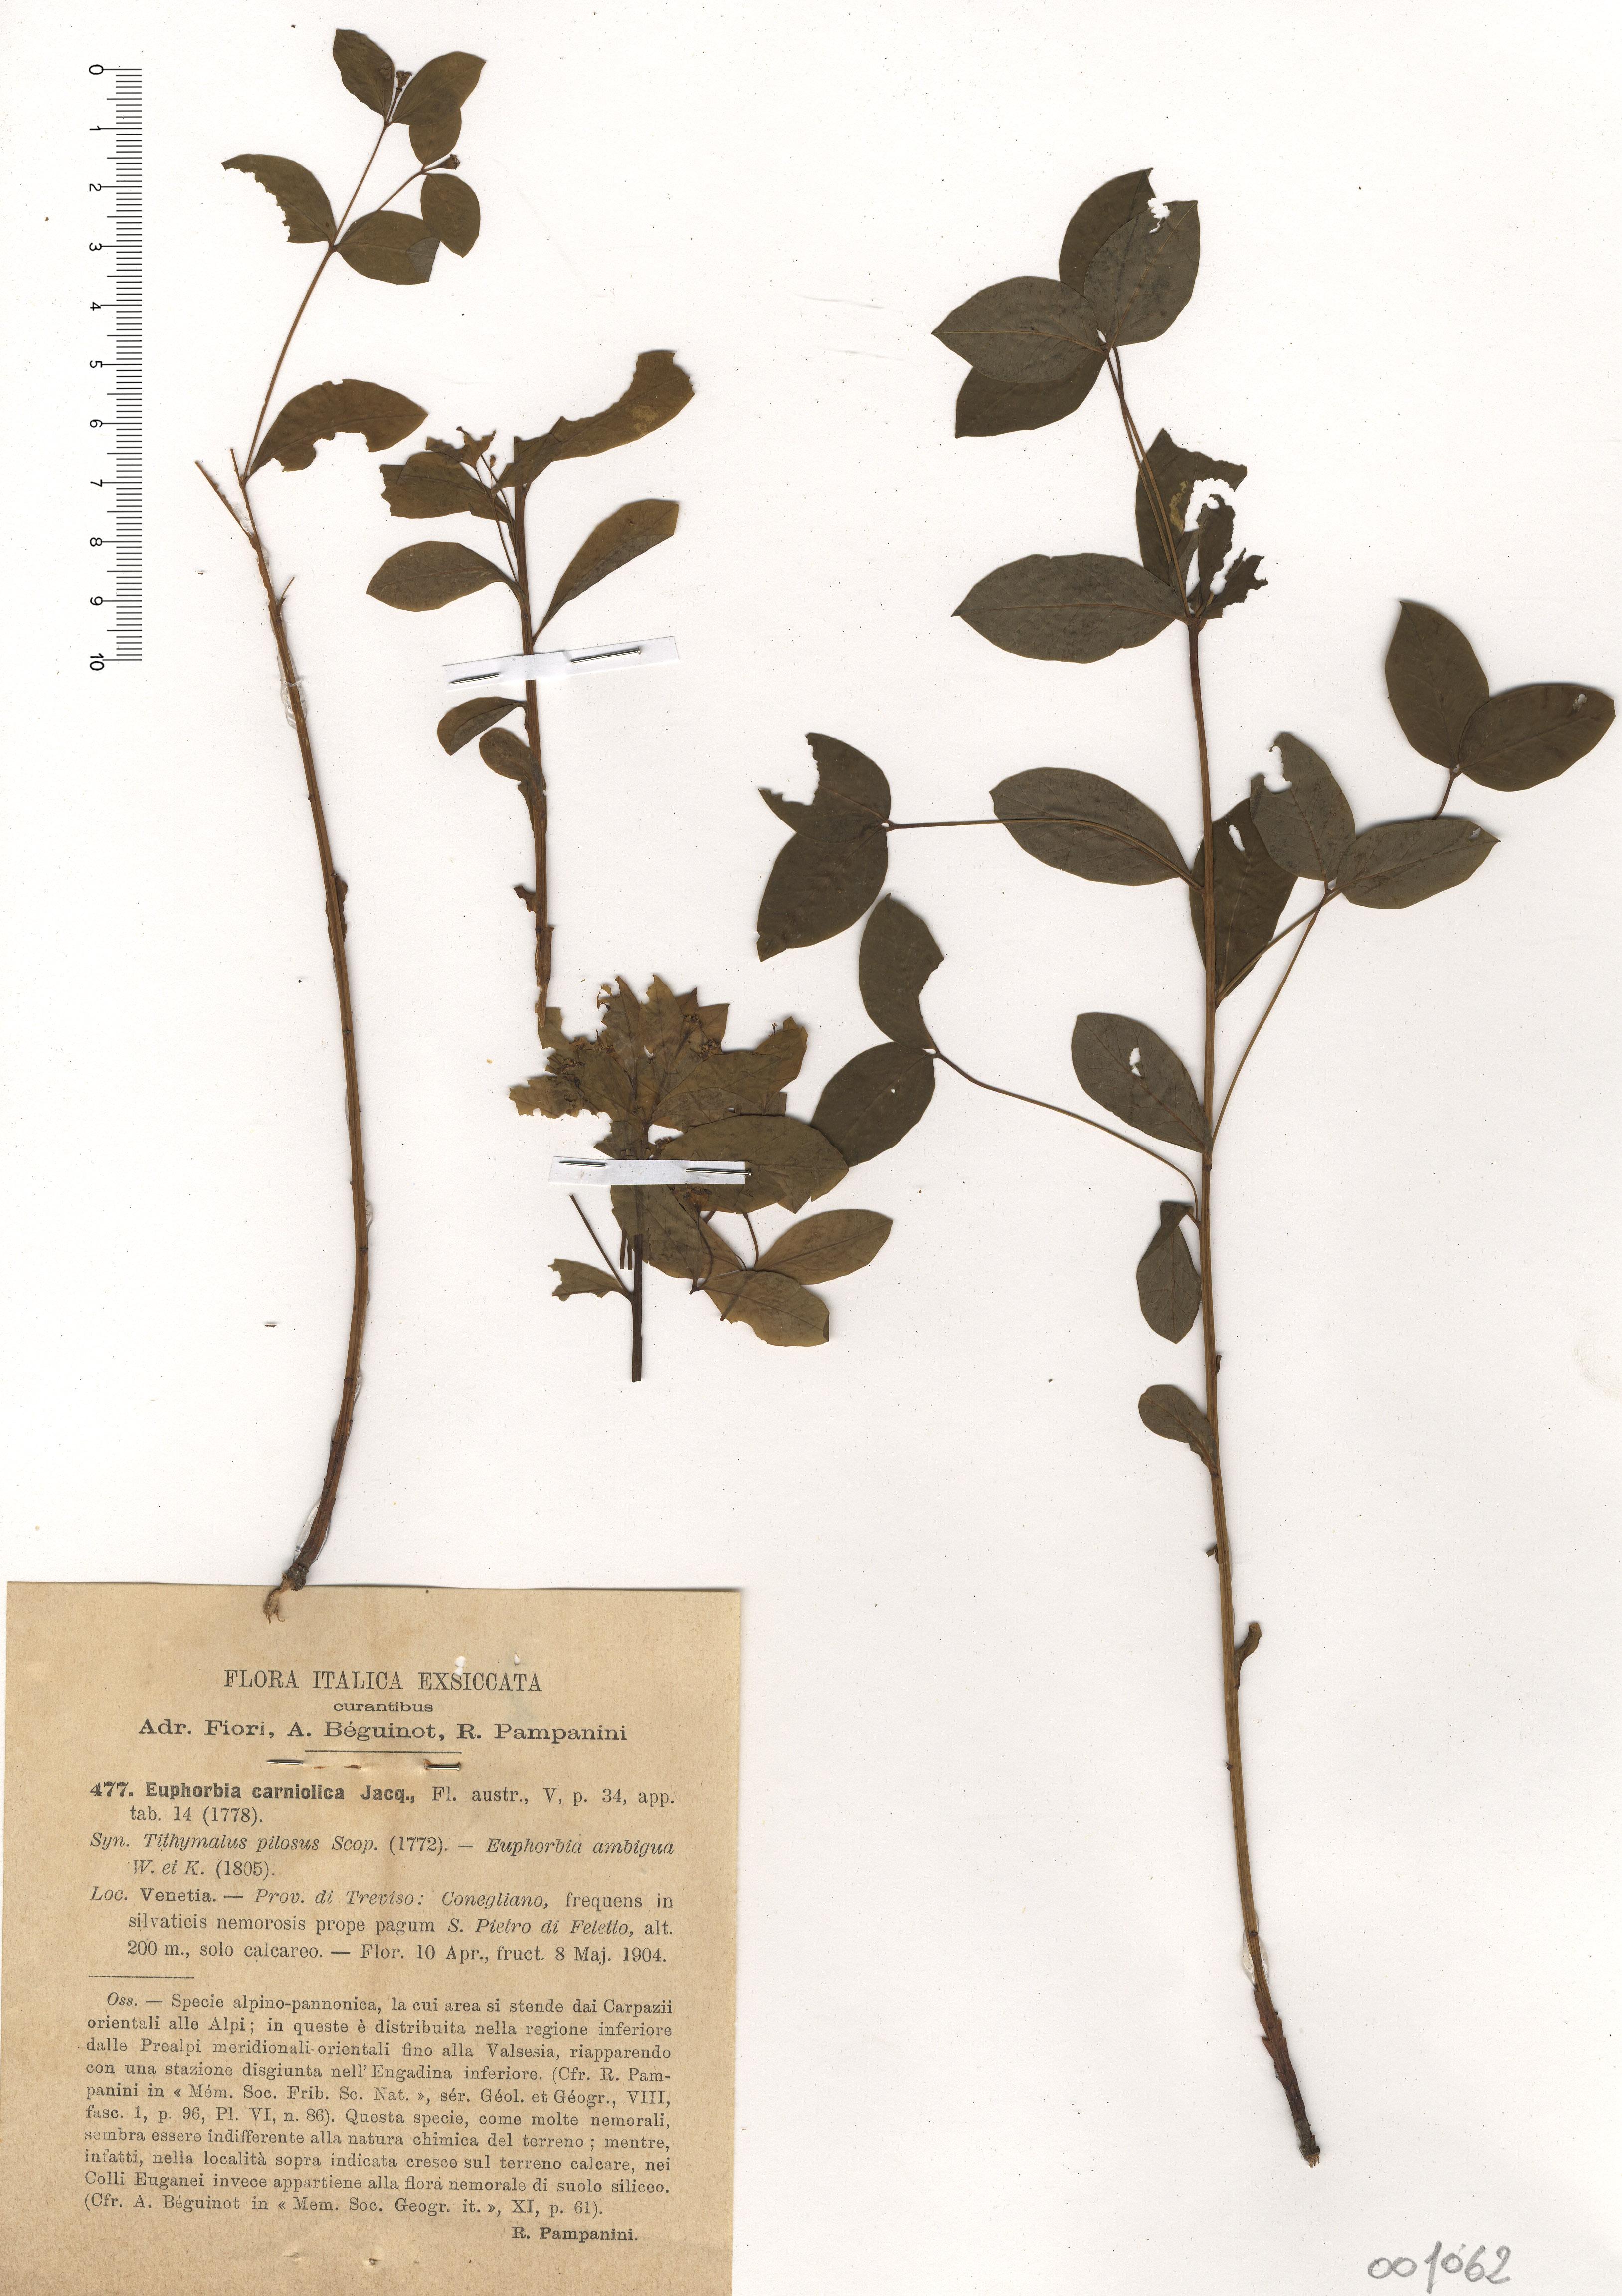 © Hortus Botanicus Catinens - Herb. shhet 001062<br>